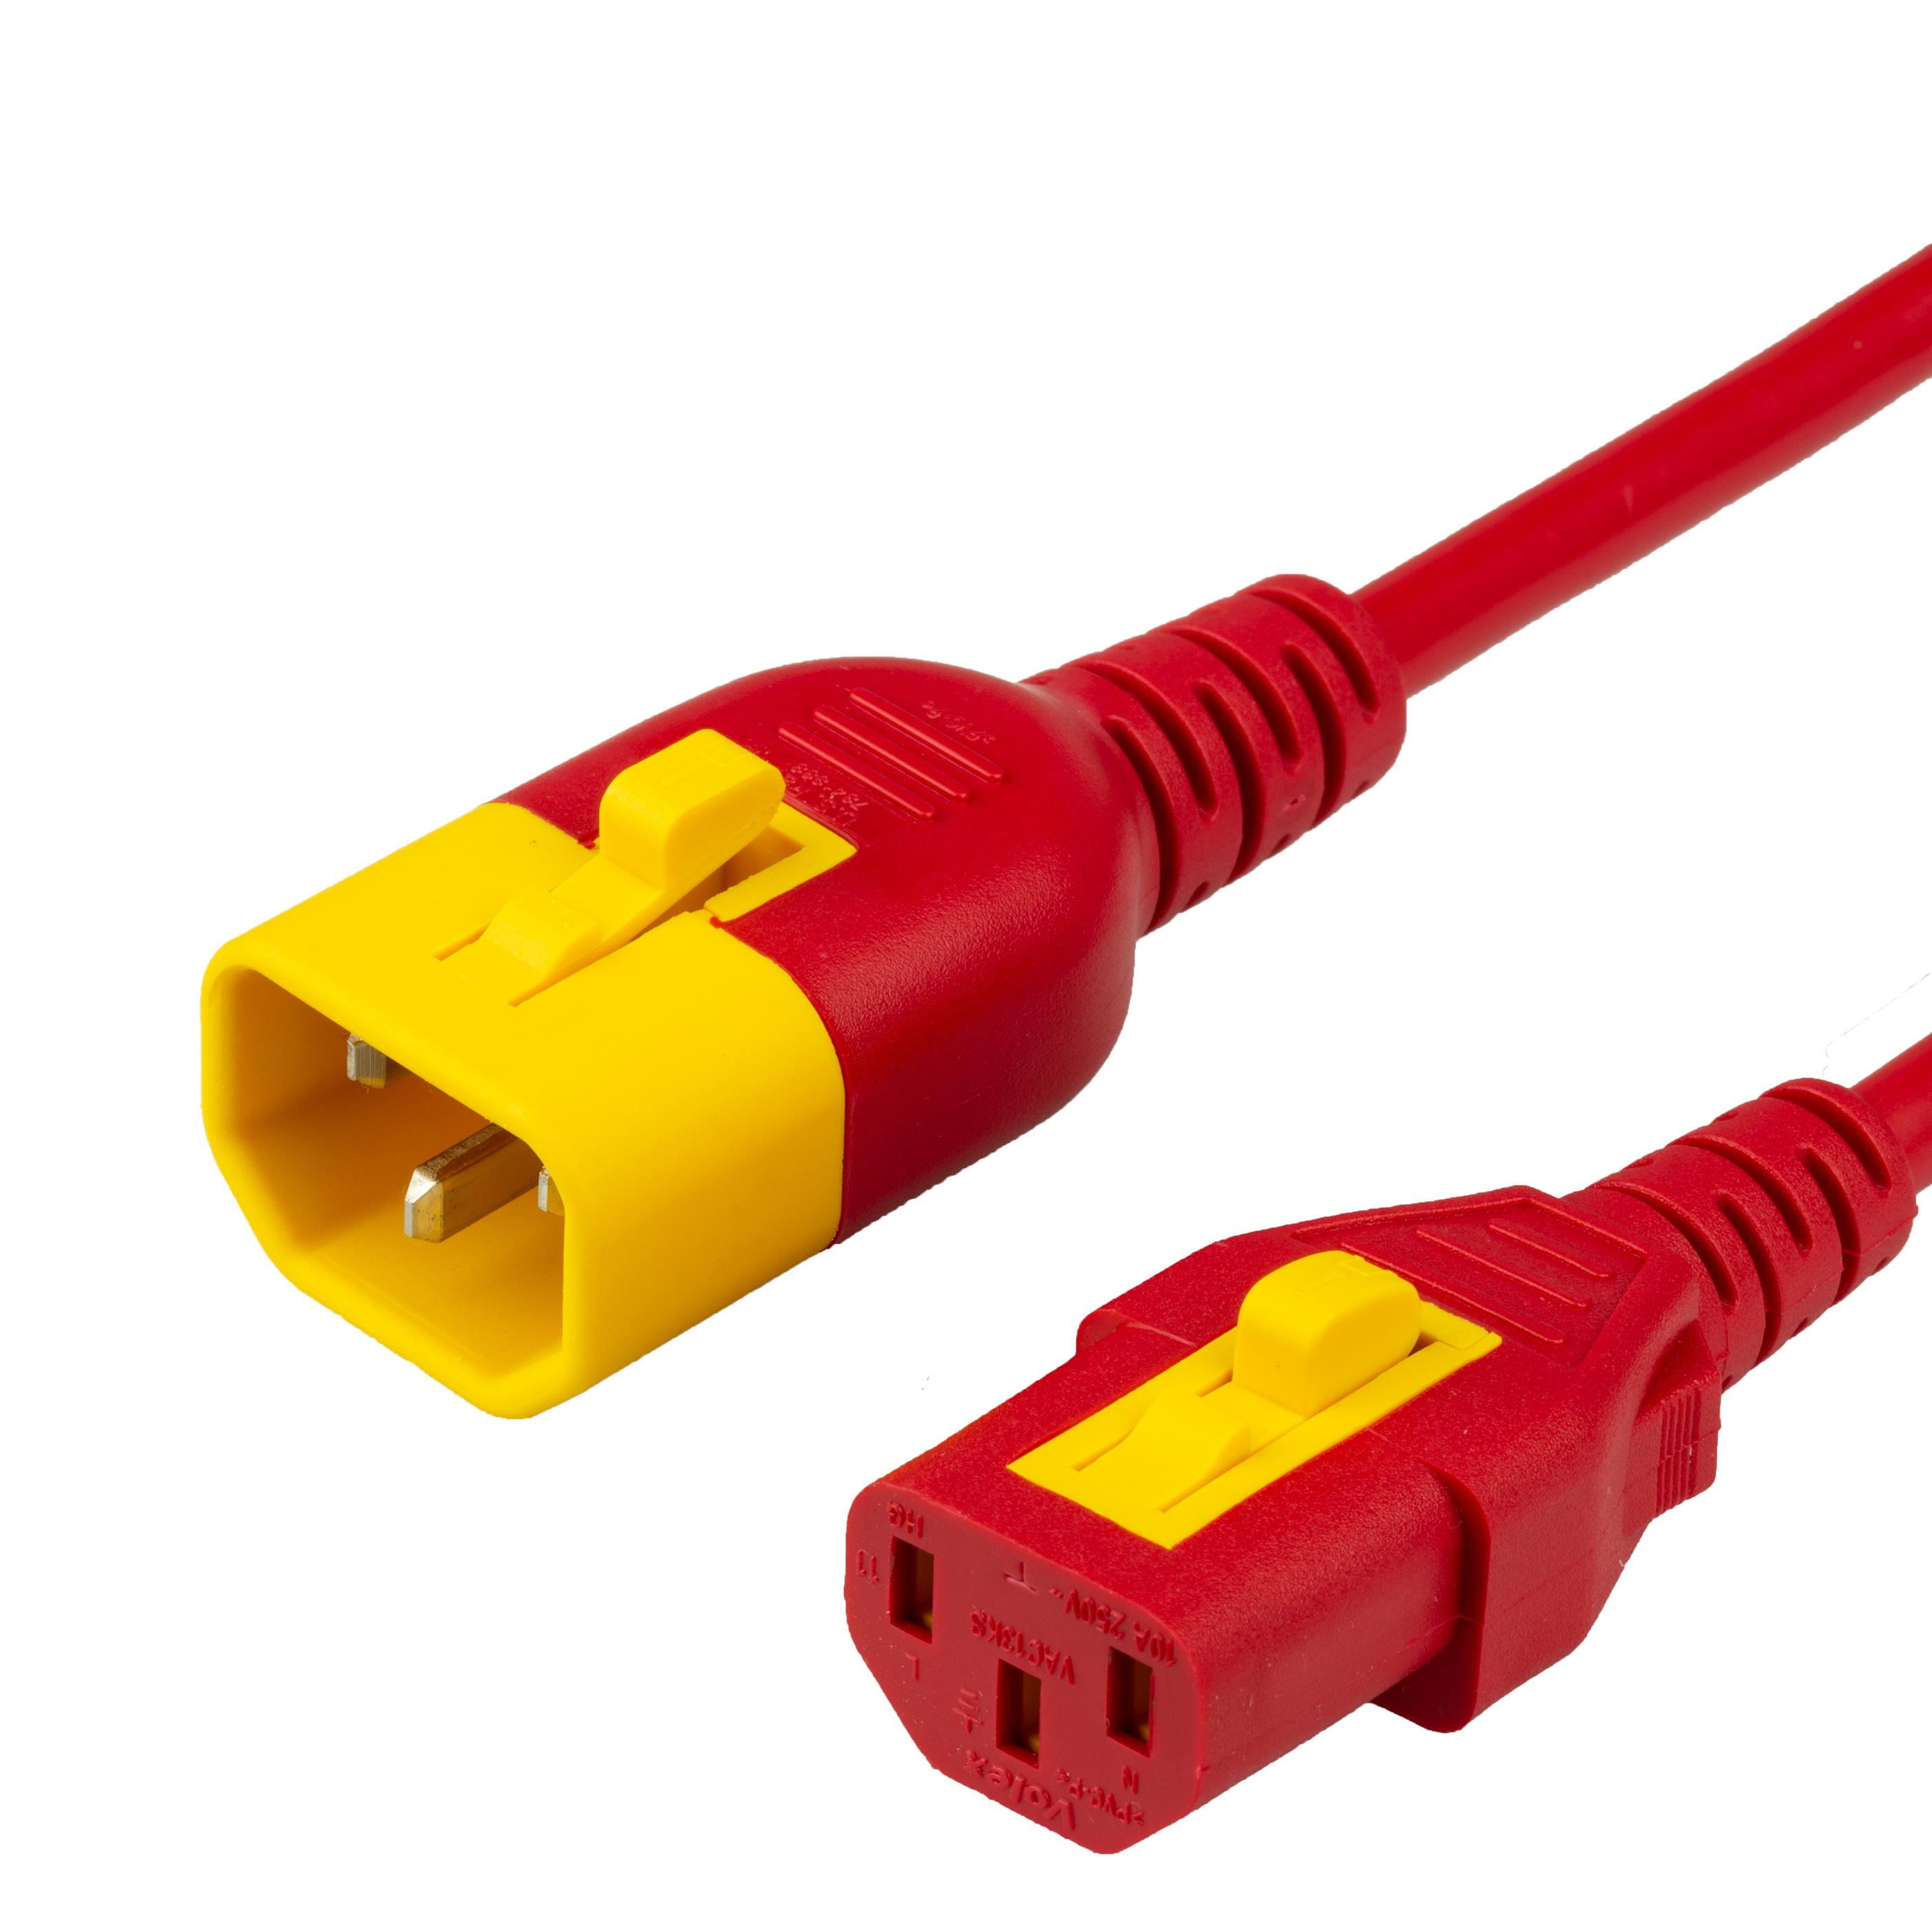 2FT C13 C14 V-LOCK 10A 250V RED Power Cord